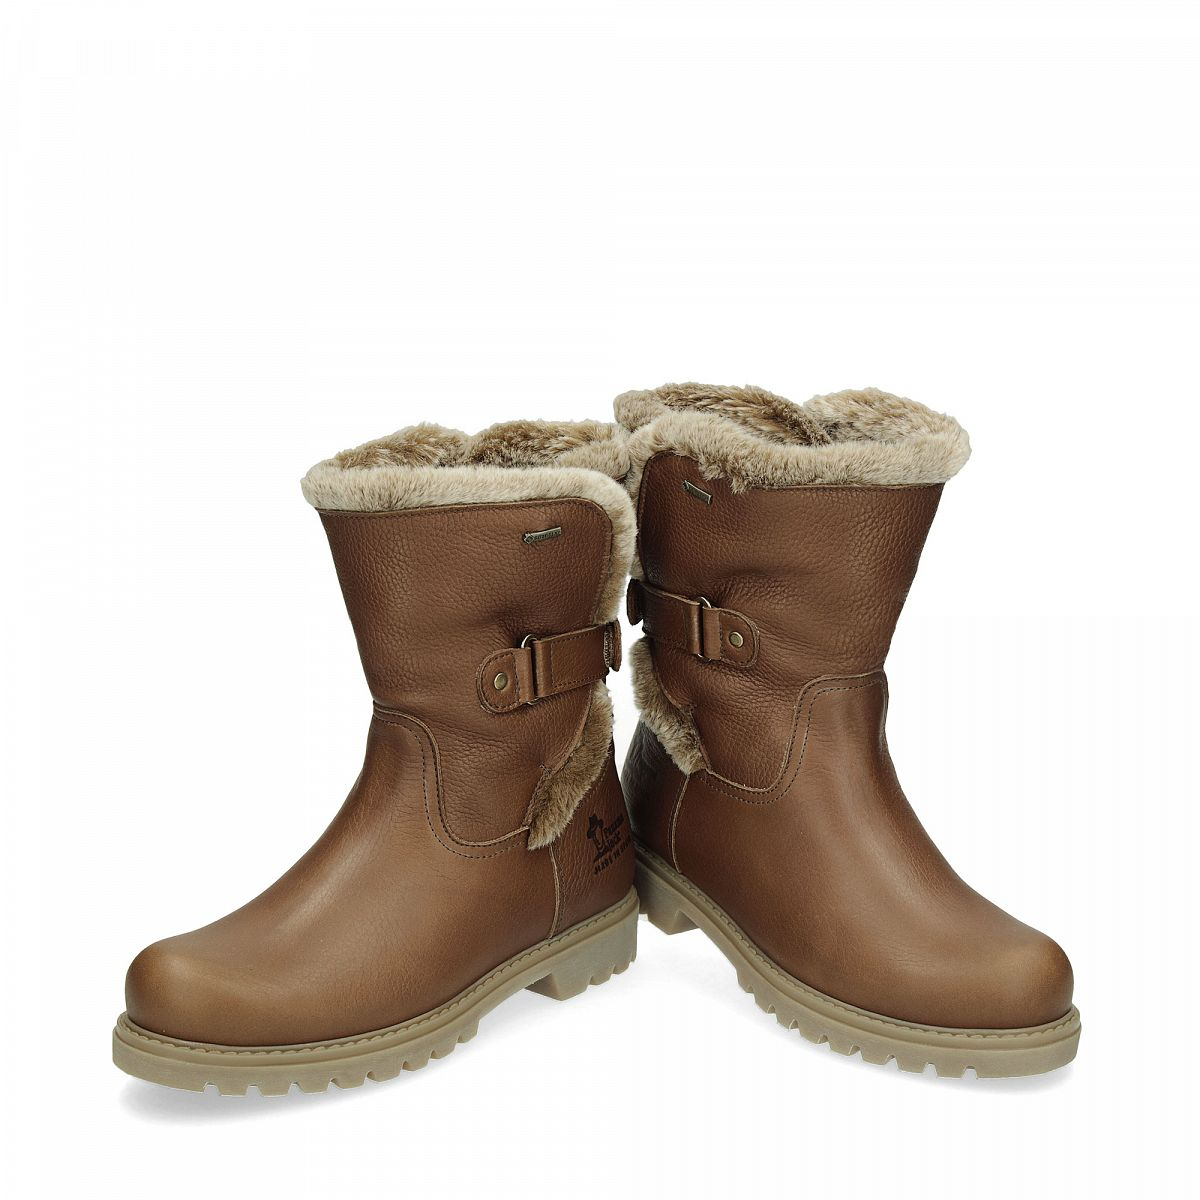 women s boot felia gtx tan panama jack official. Black Bedroom Furniture Sets. Home Design Ideas